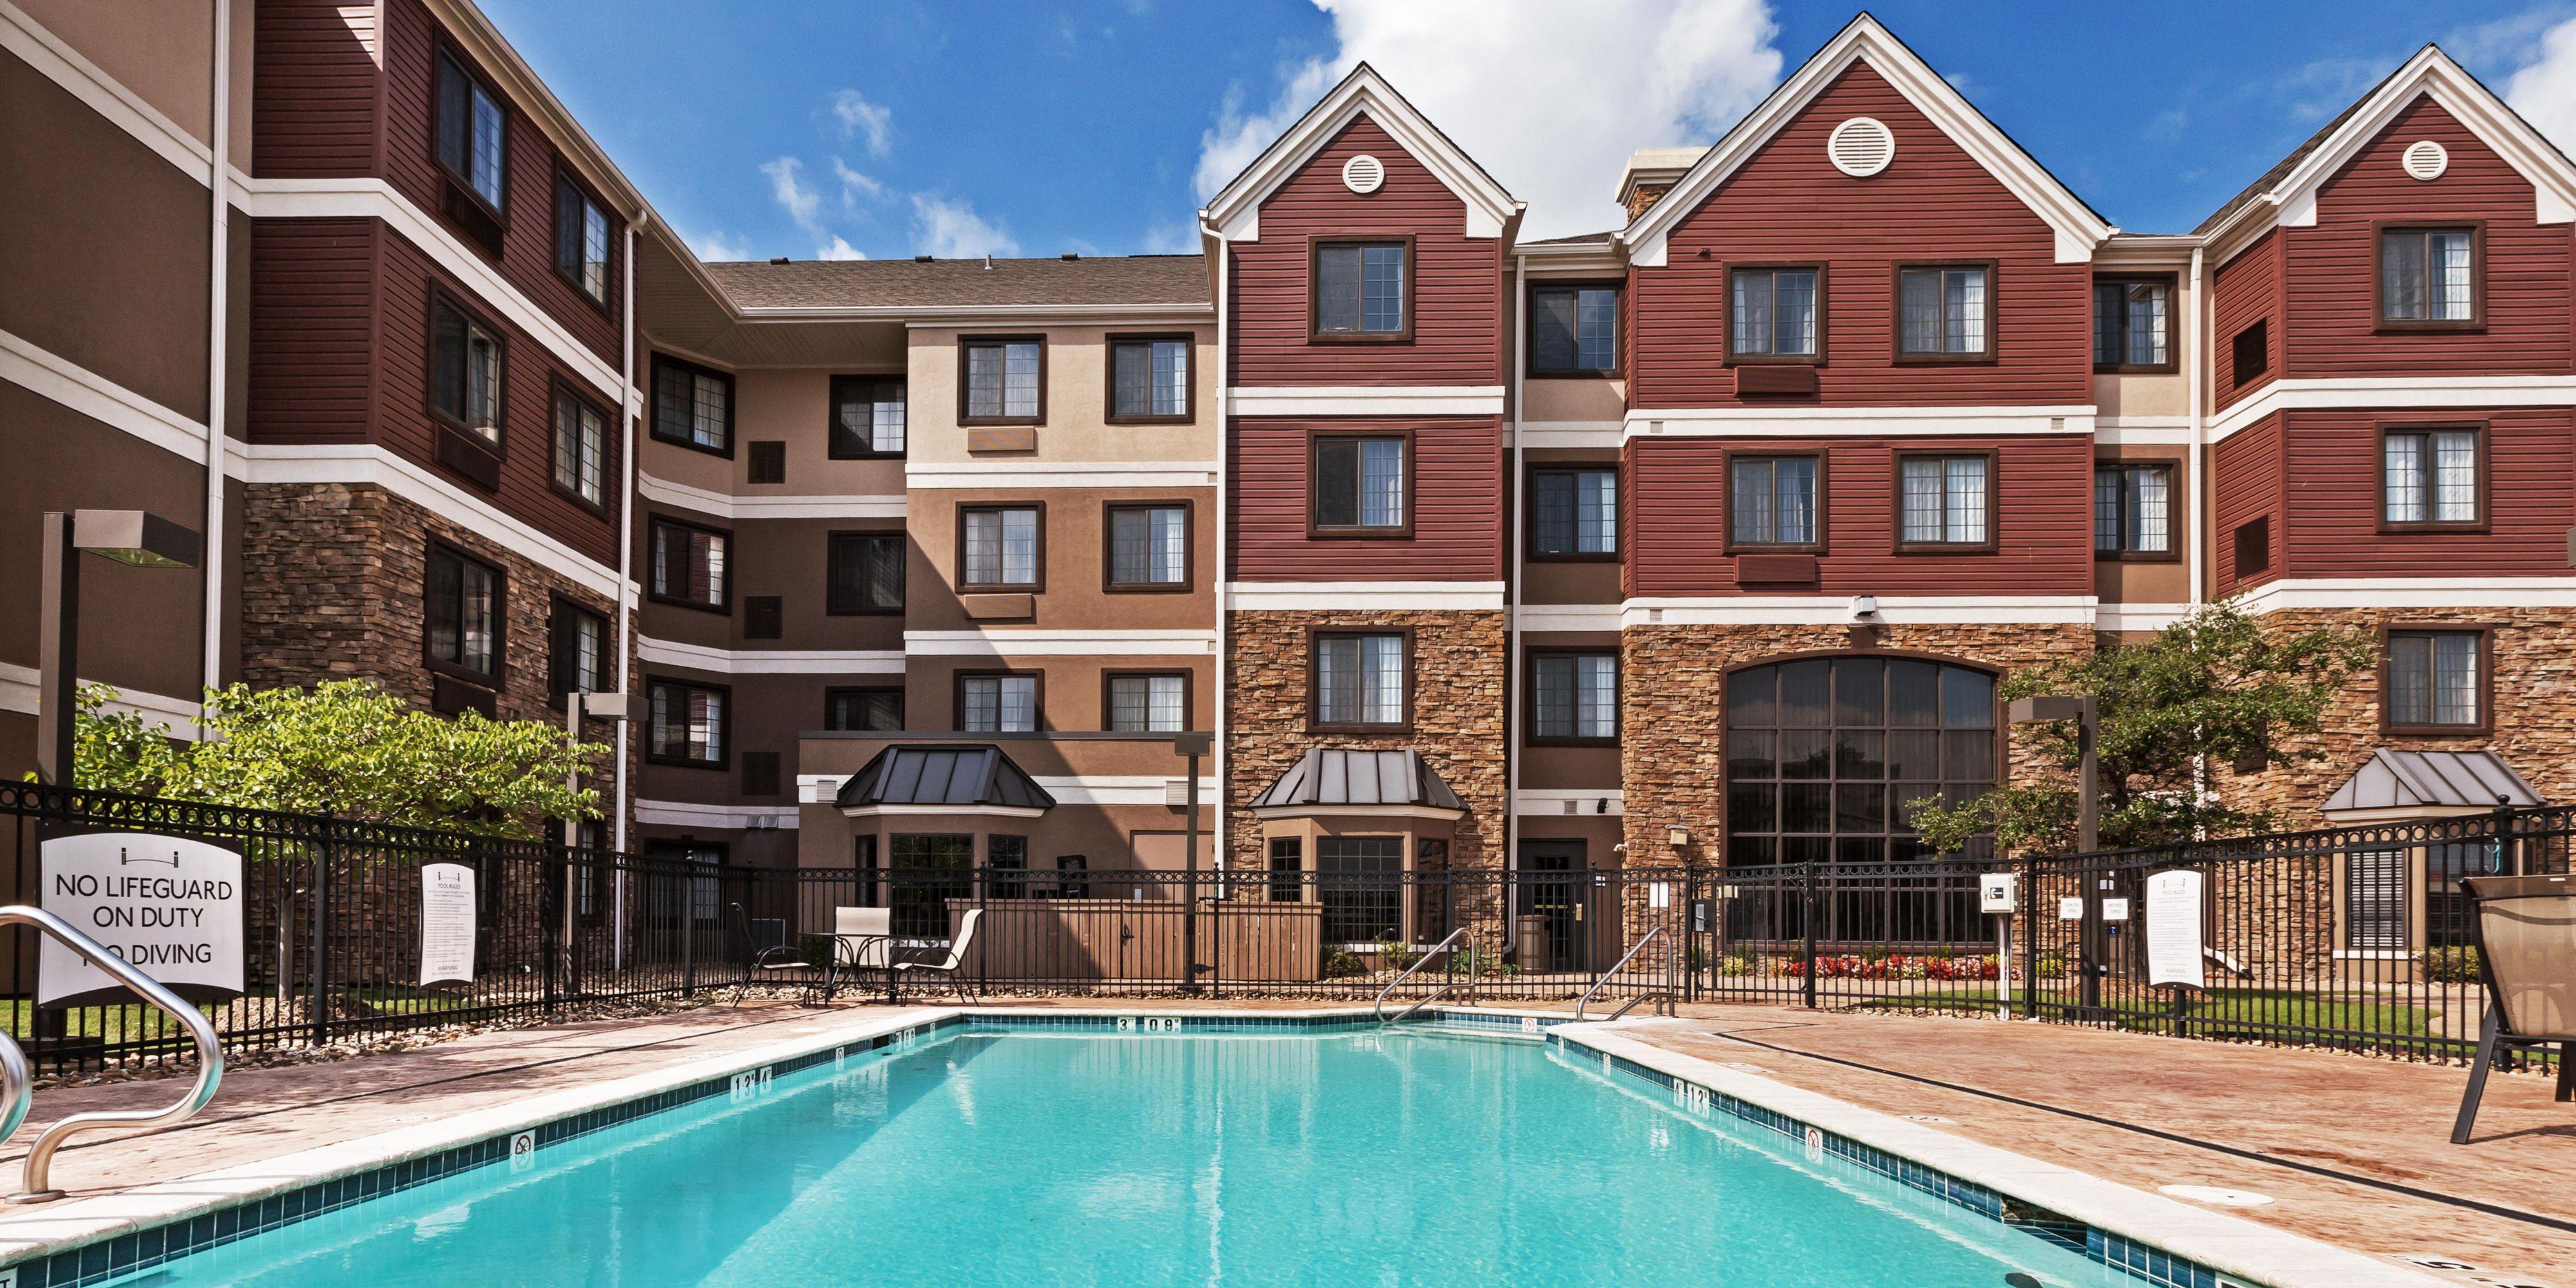 Staybridge Suites Tulsa-Woodland Hills image 2